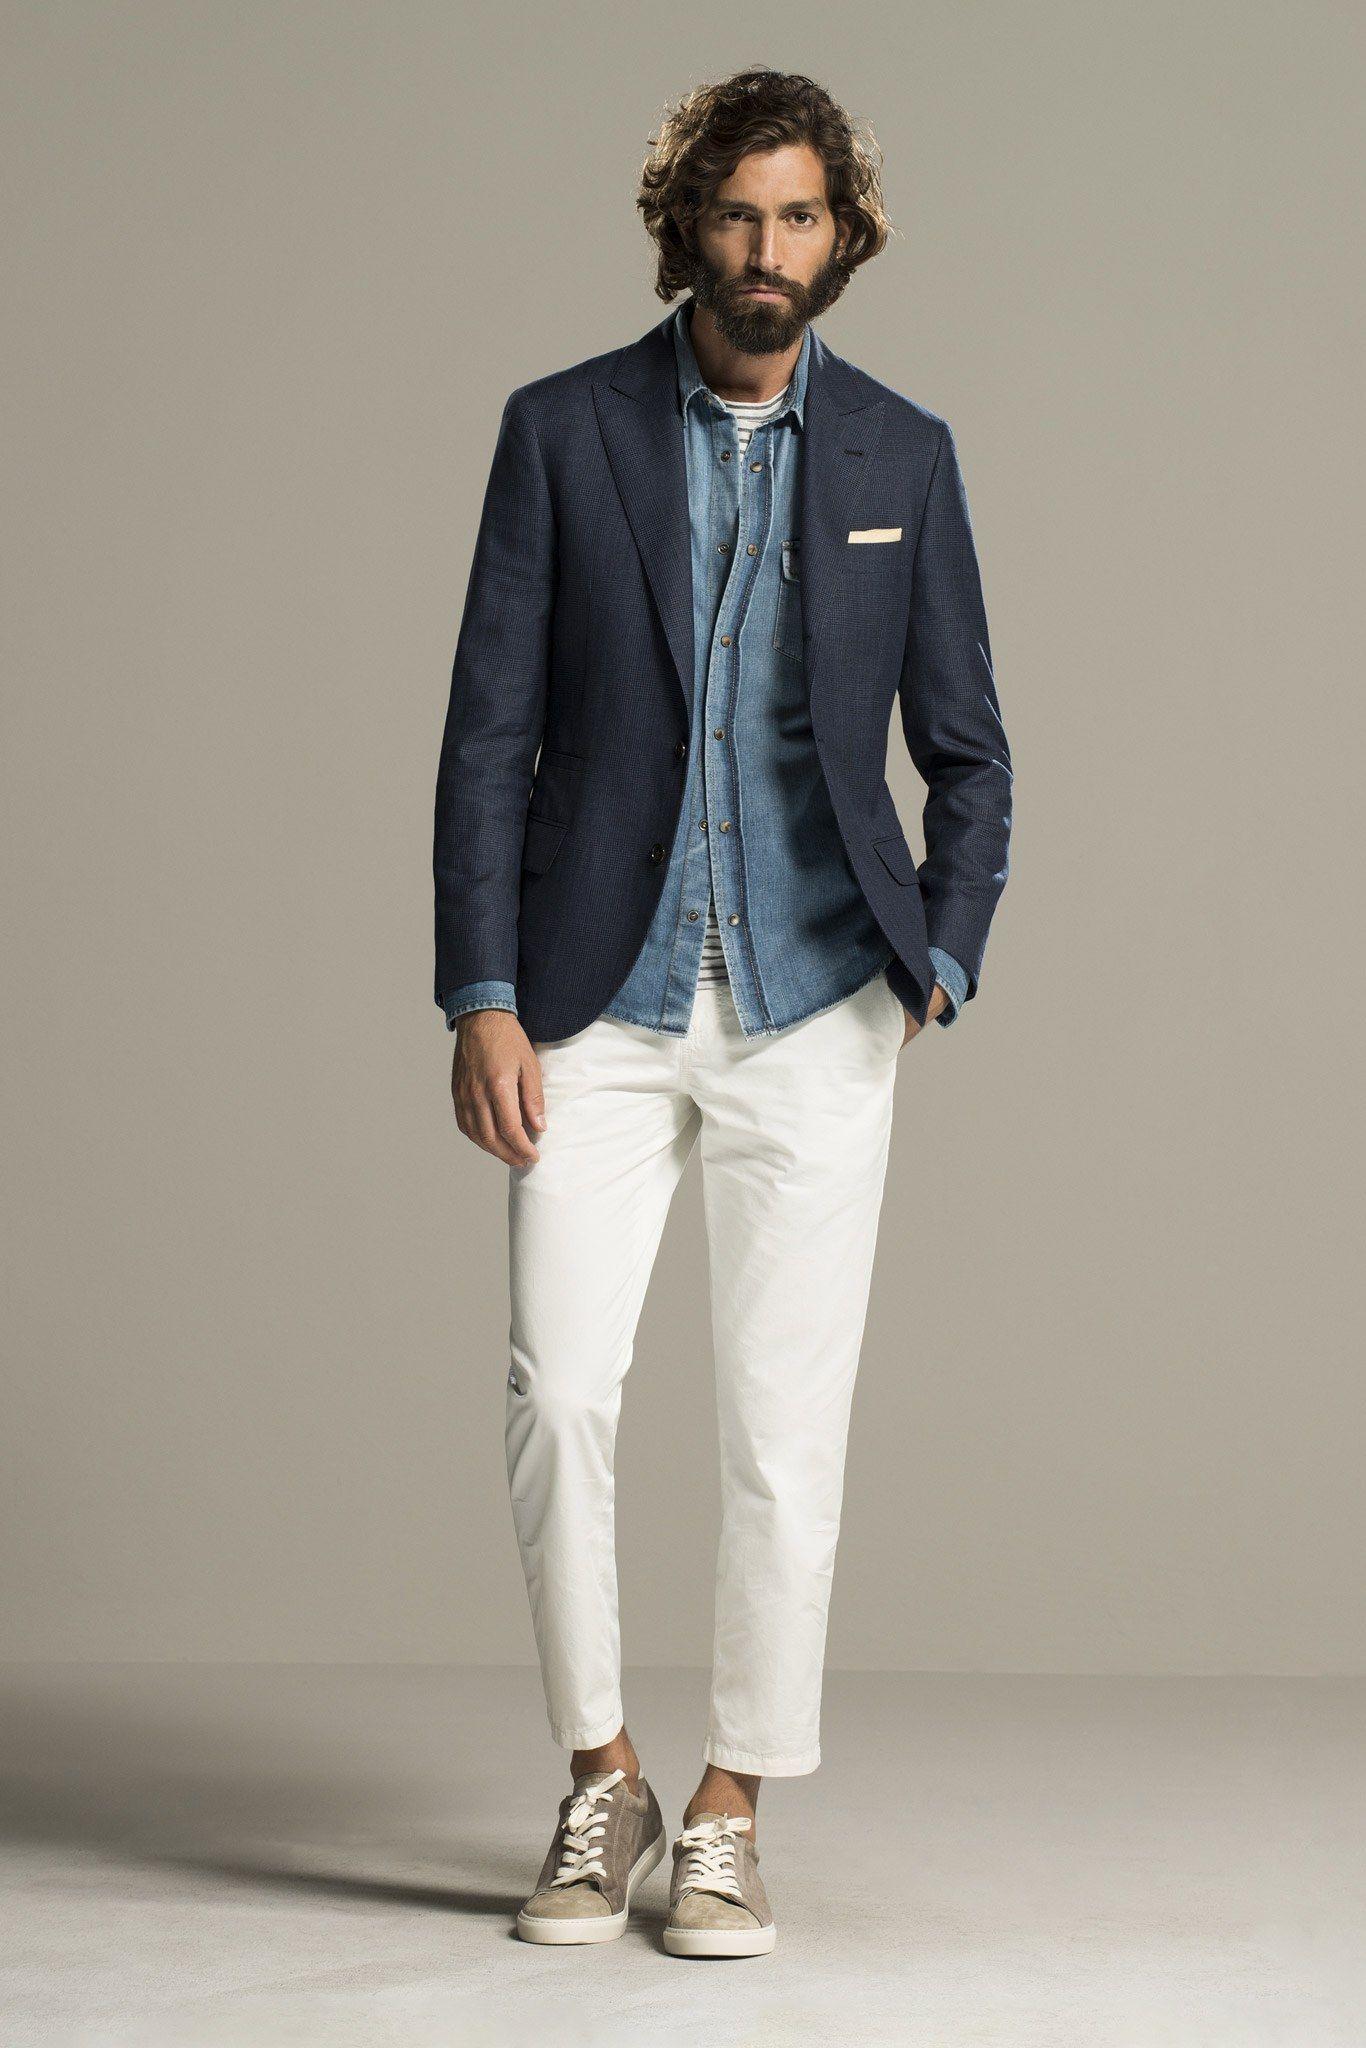 Pinterest Picks – Spring Menswear Style Inspiration ...